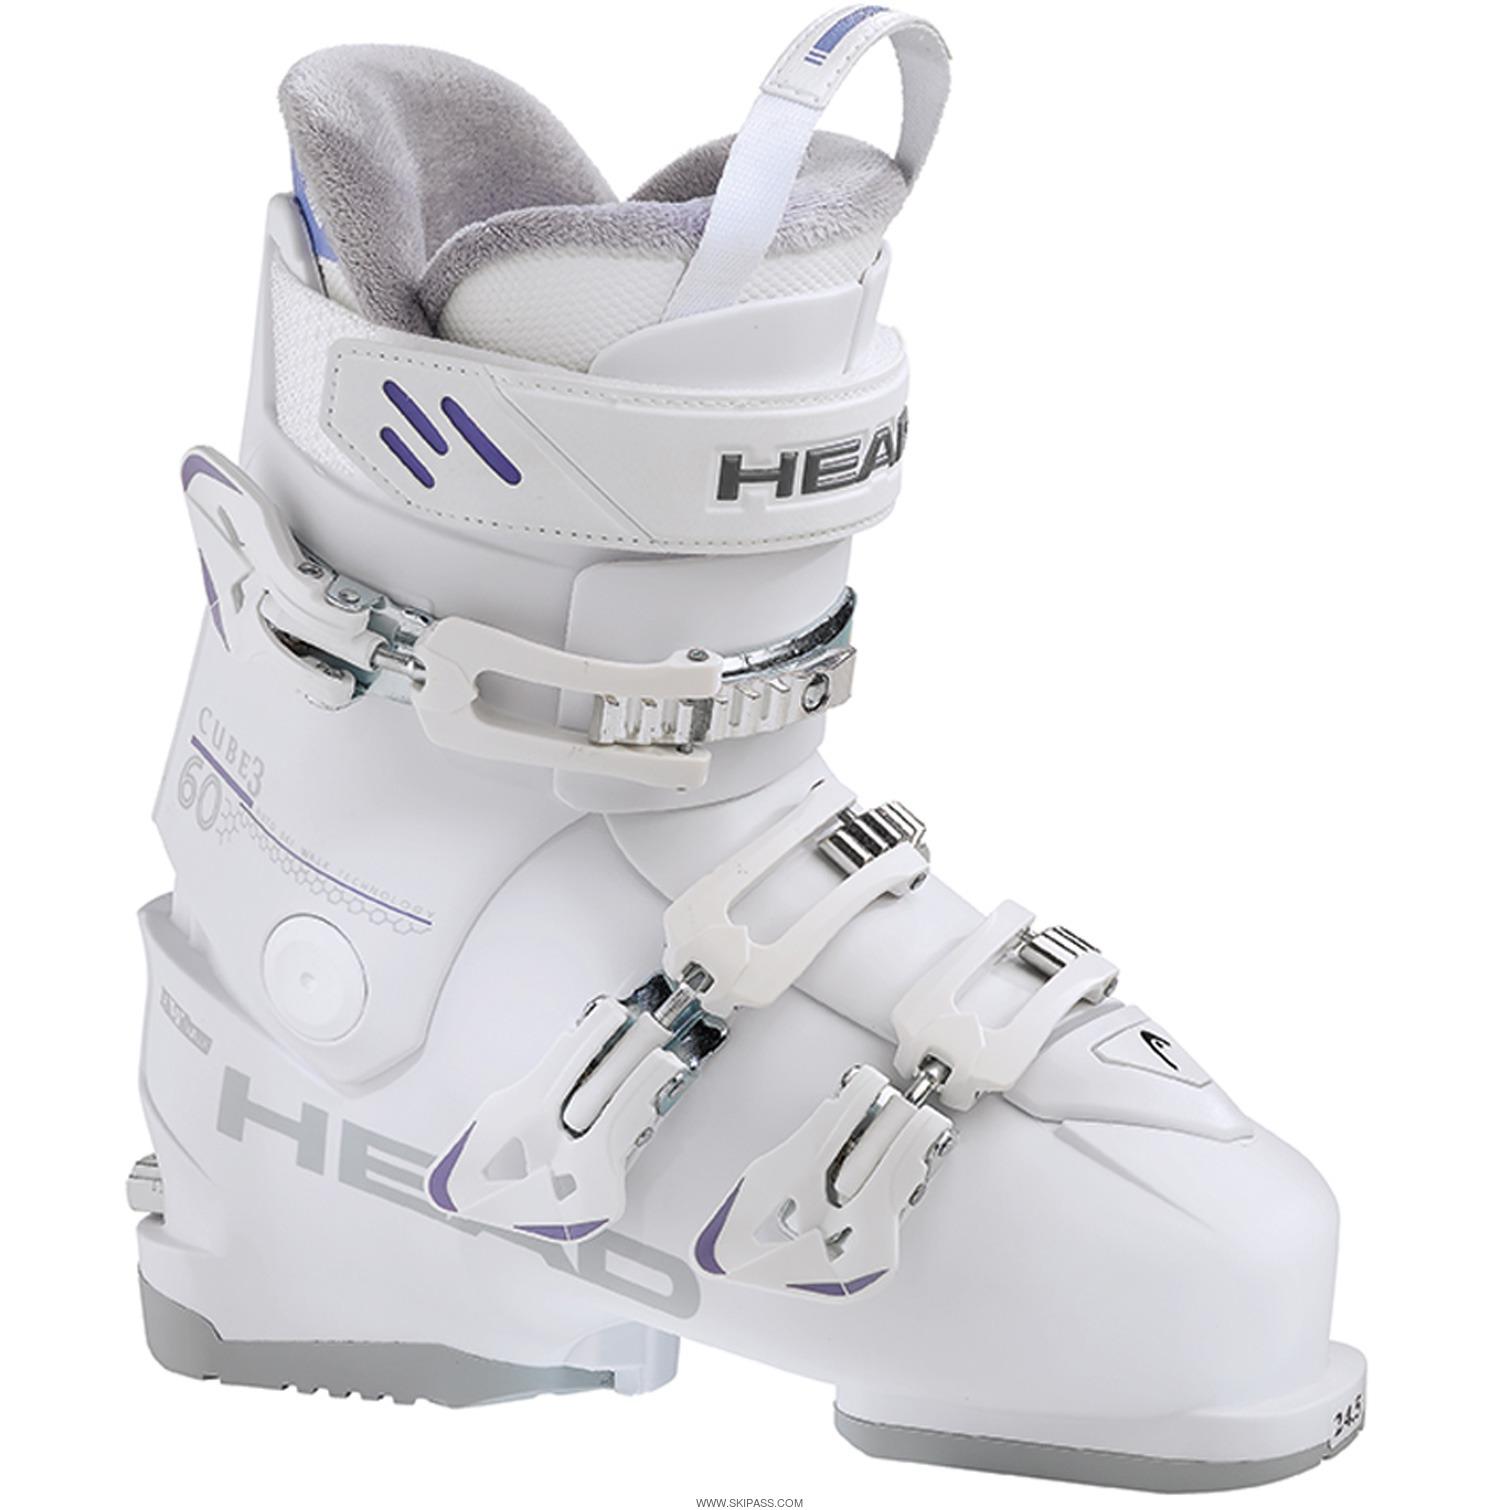 Chaussures De Ski Head Cube 3 60 W White